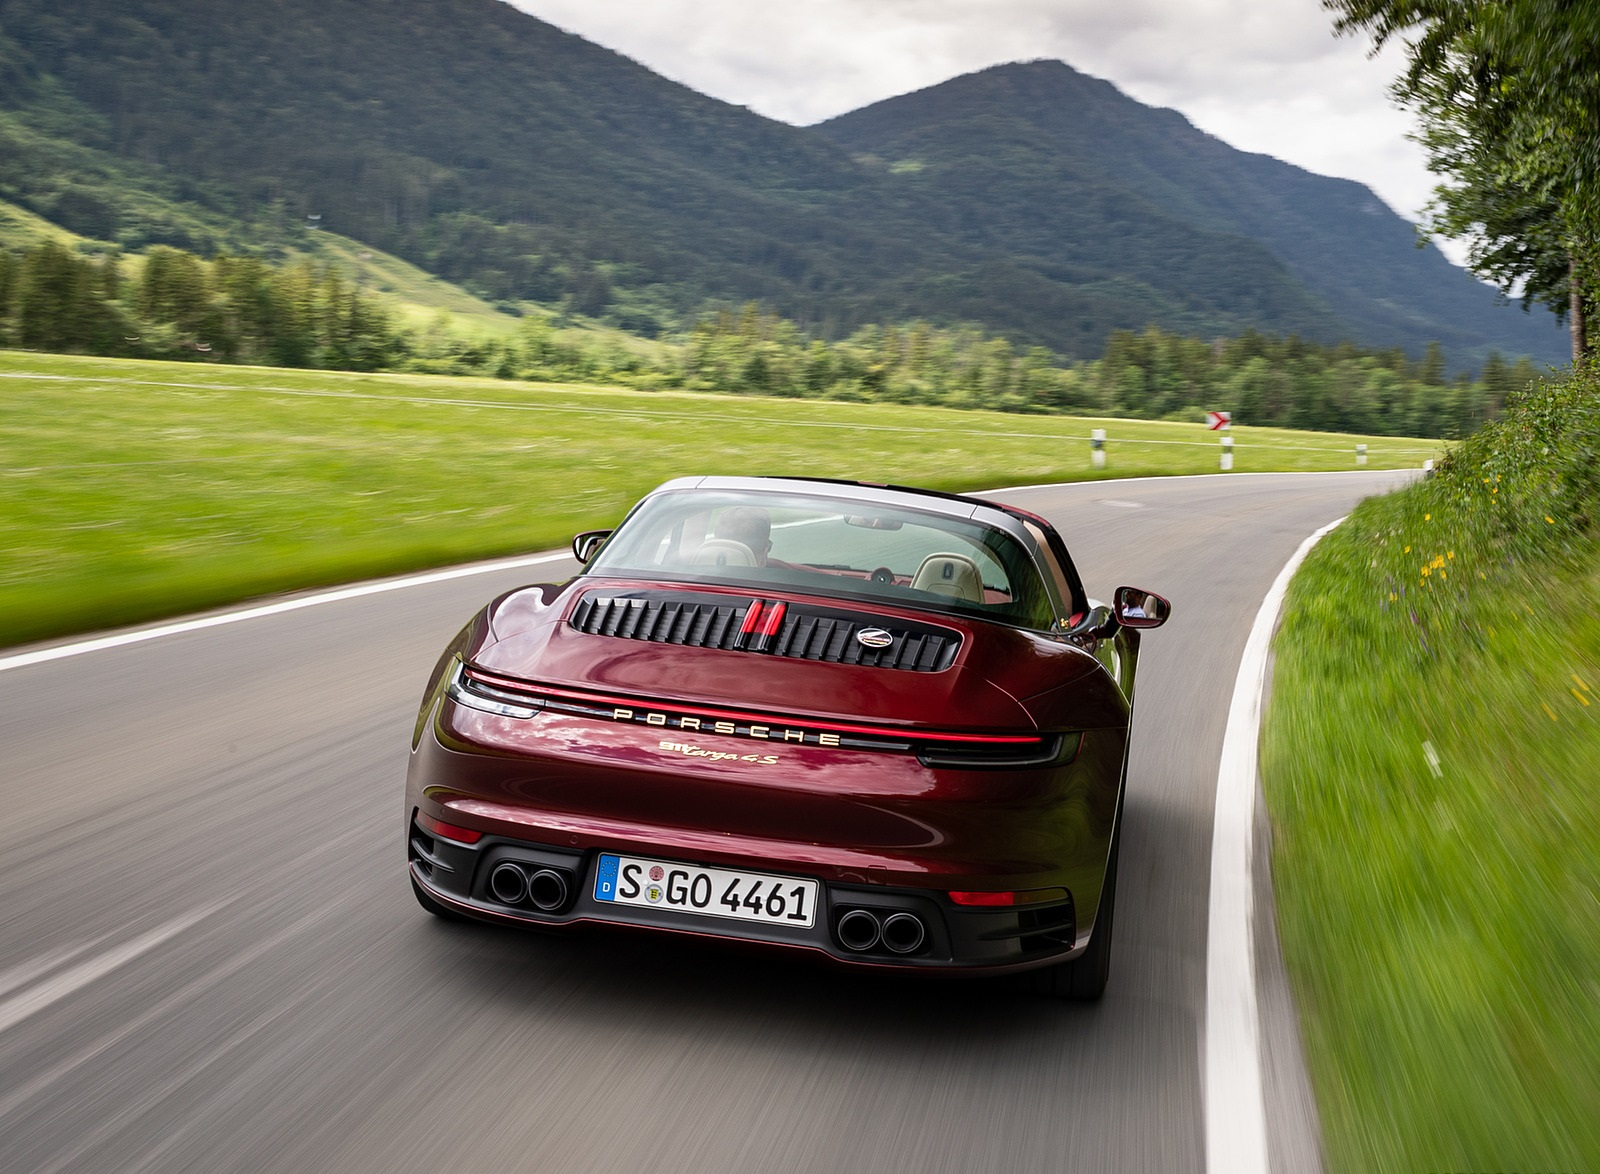 2021 Porsche 911 Targa 4S Heritage Design Edition (Color: Cherry Metallic) Rear Wallpapers (5)